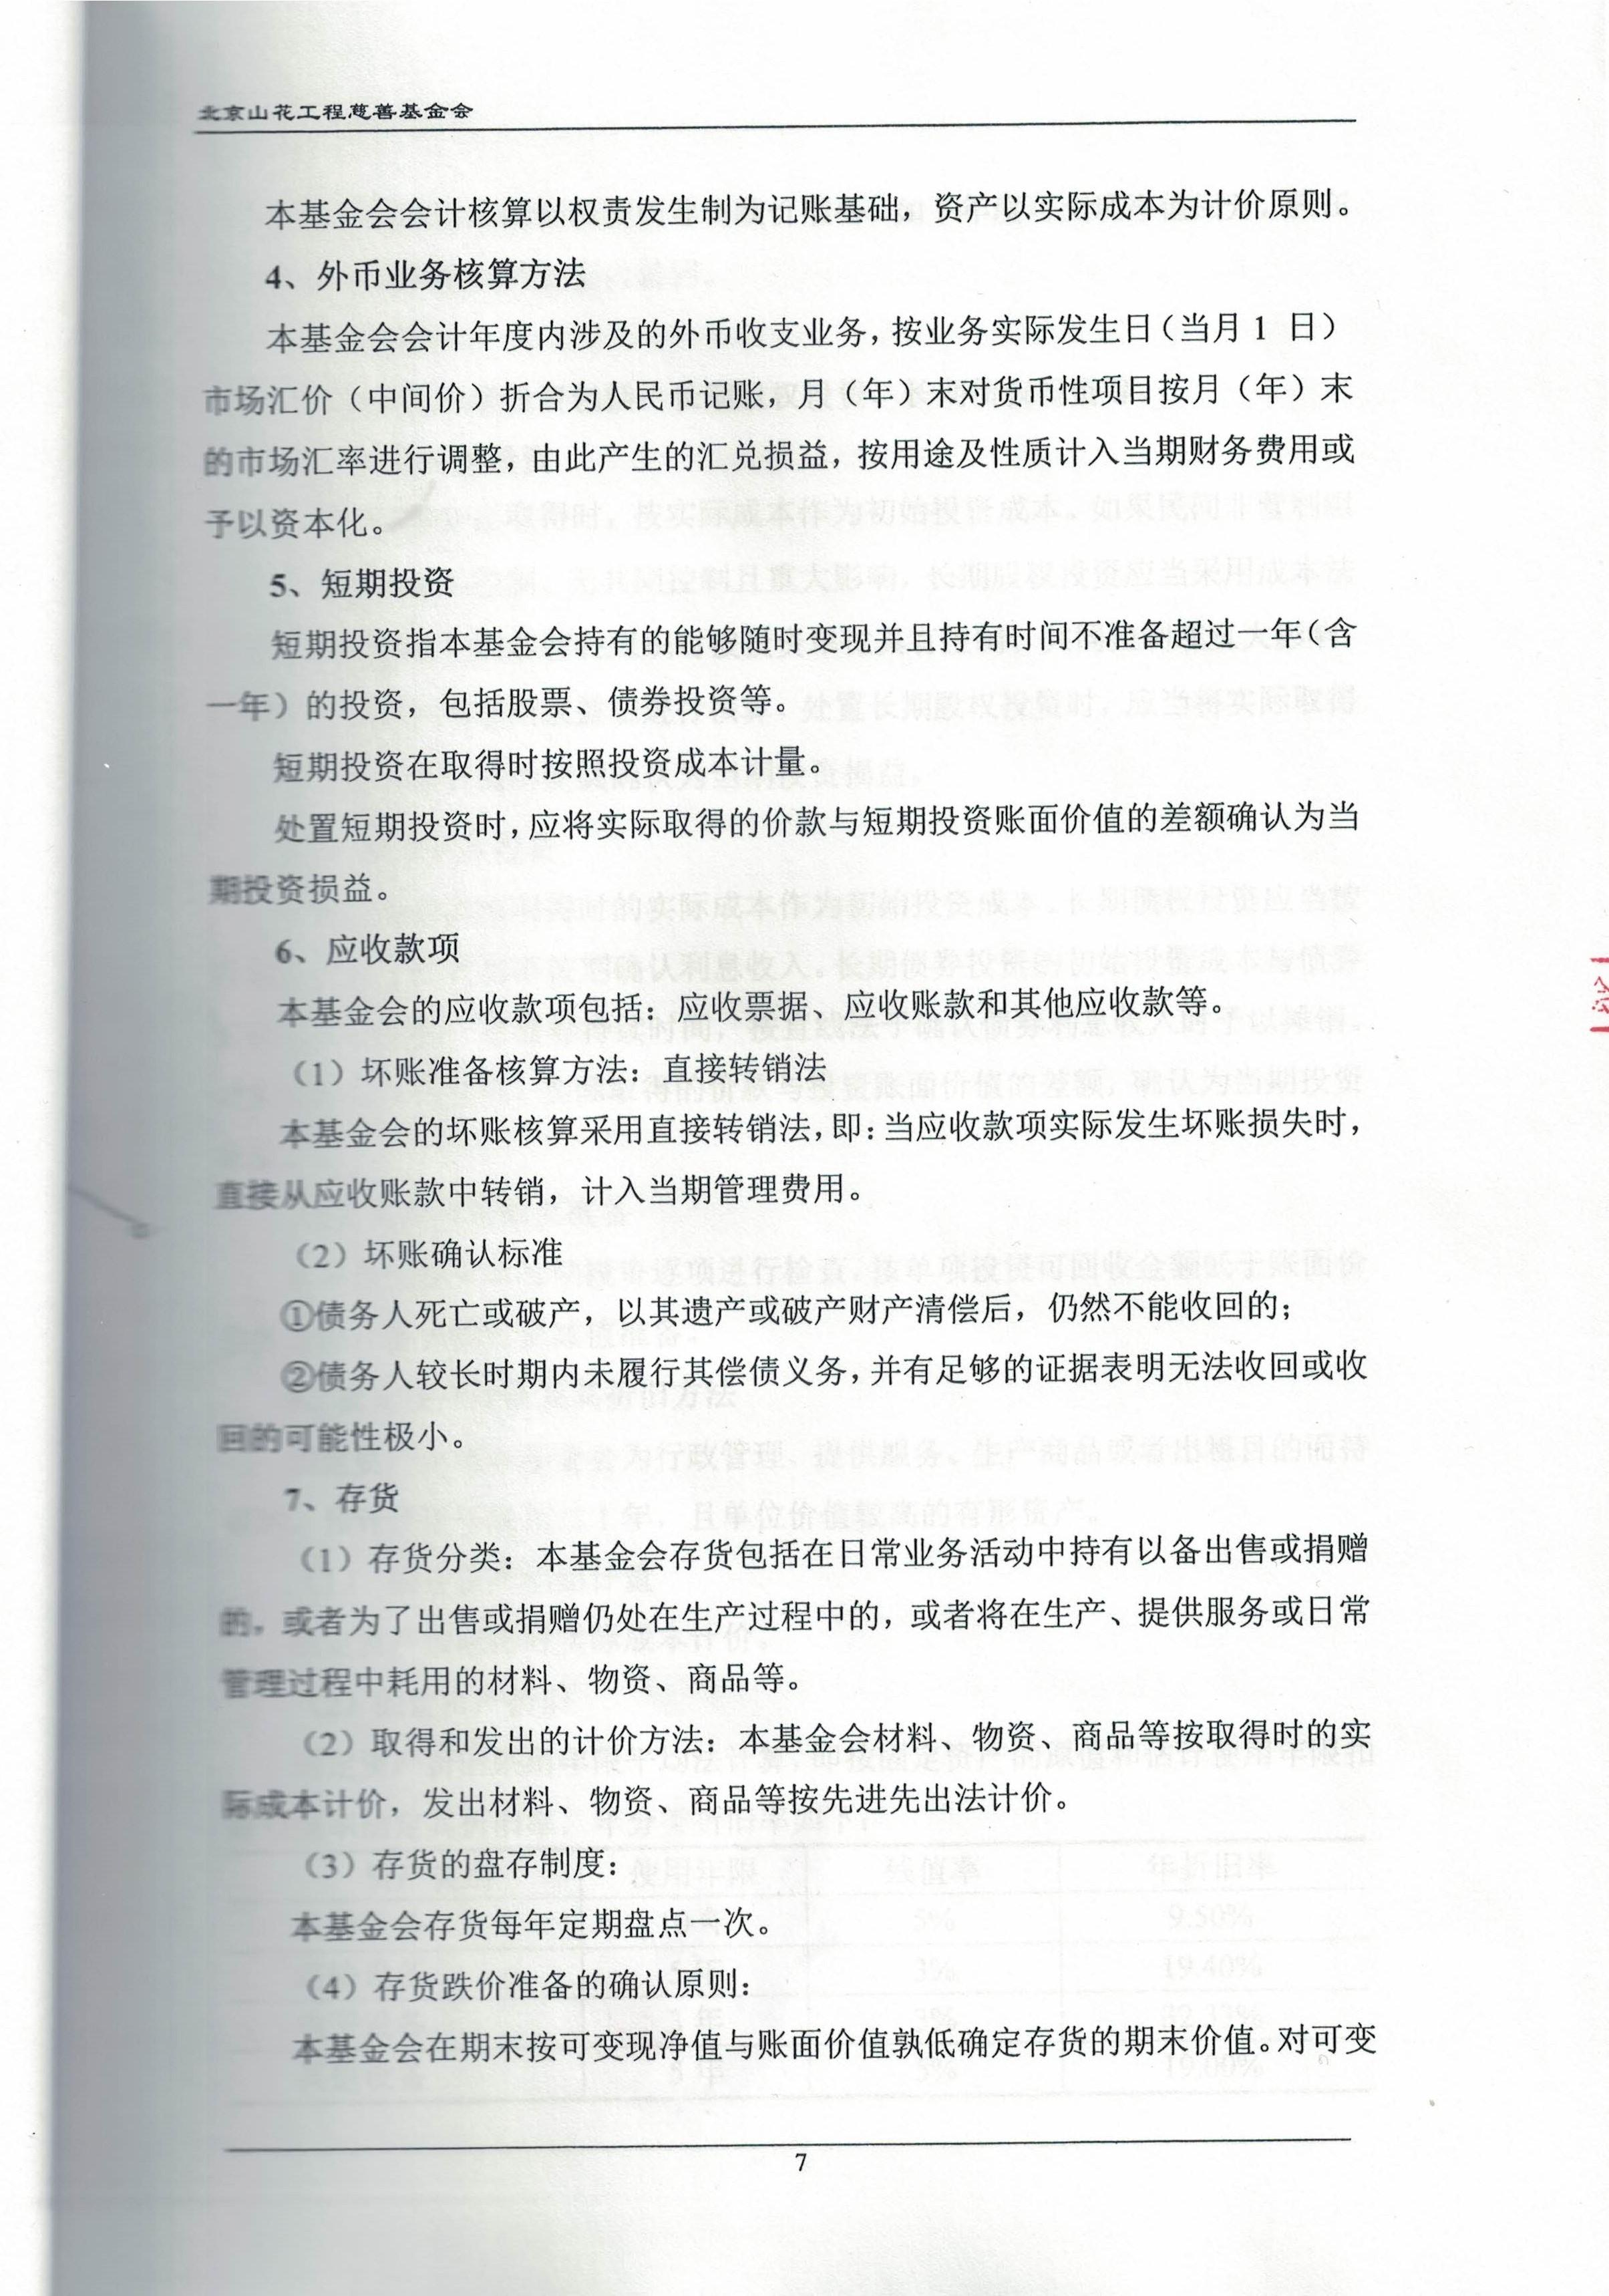 CCF20210114_0001_页面_09